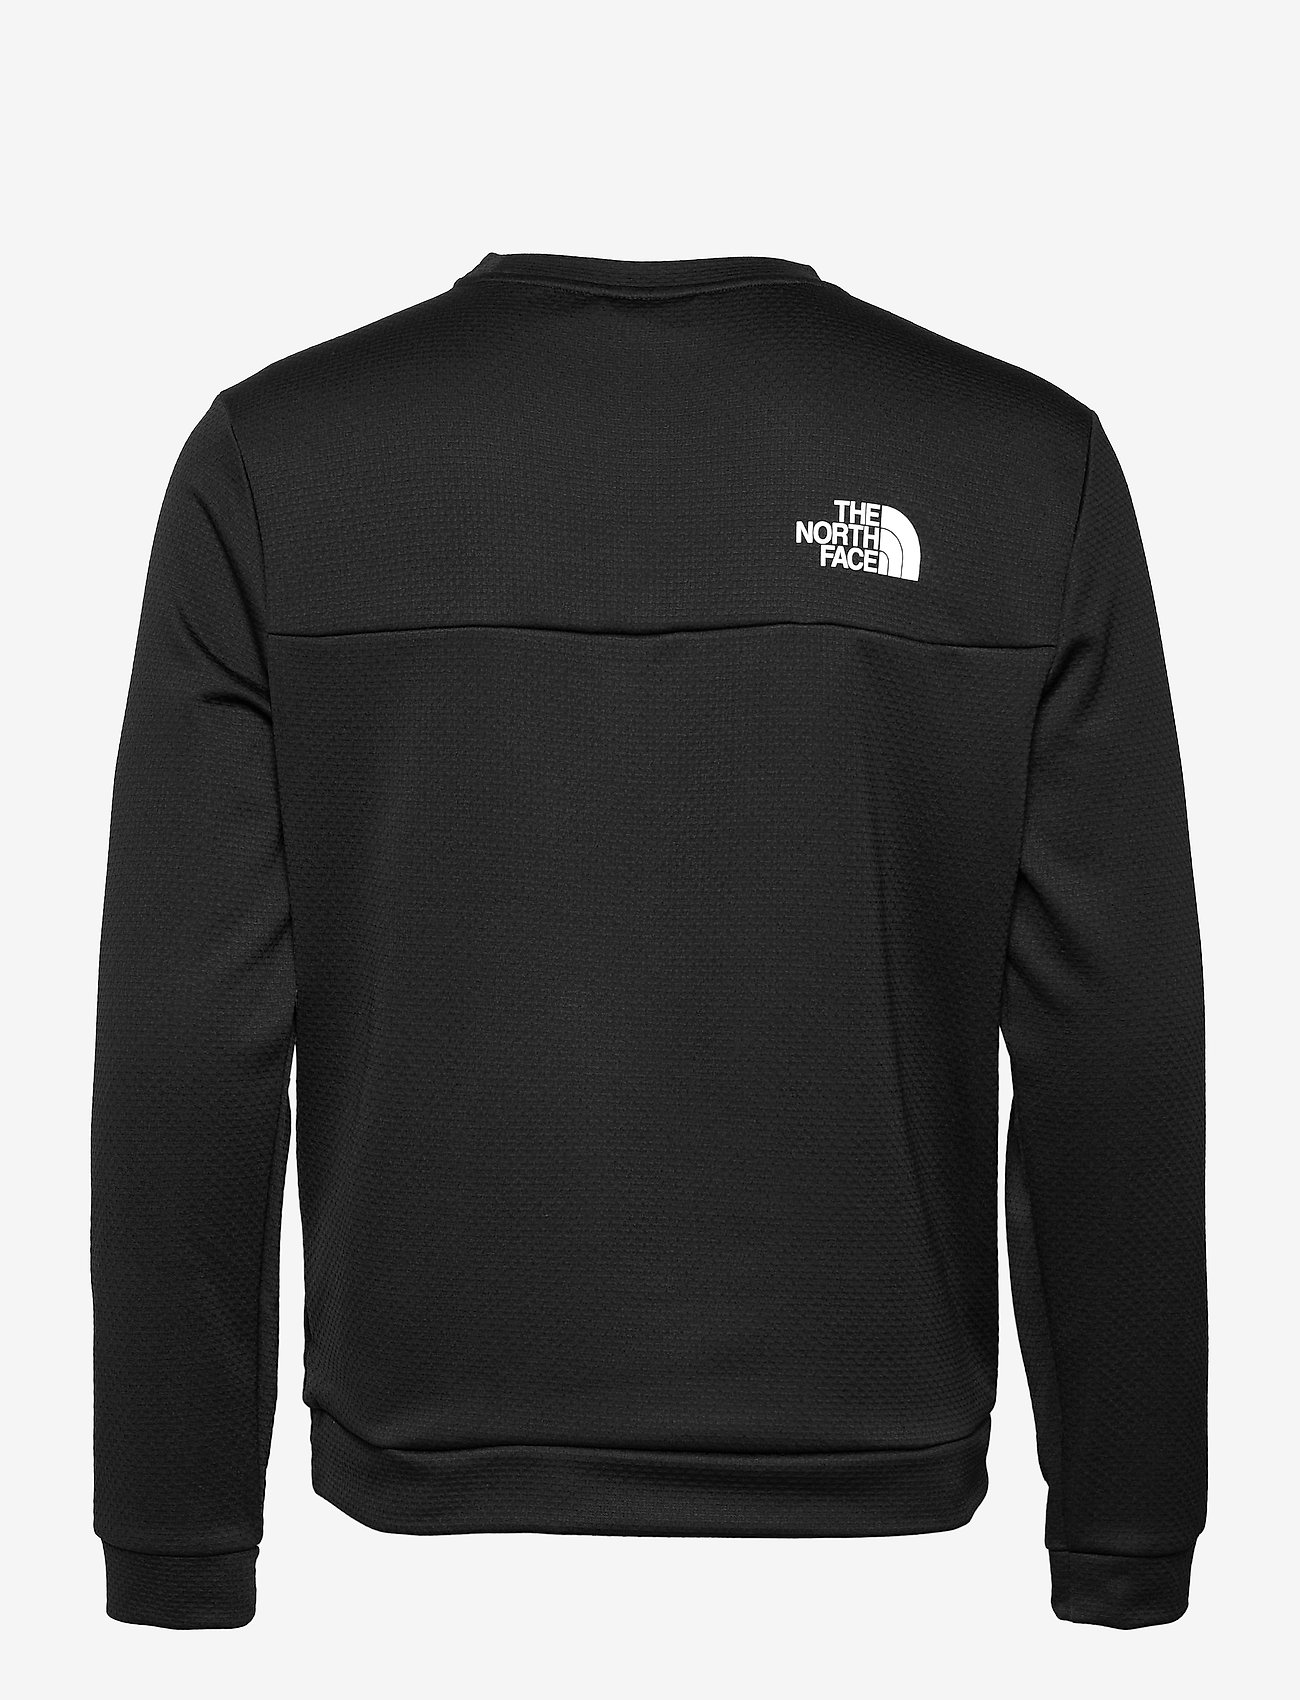 The North Face - M MA CREW - sweats basiques - tnf black - 1